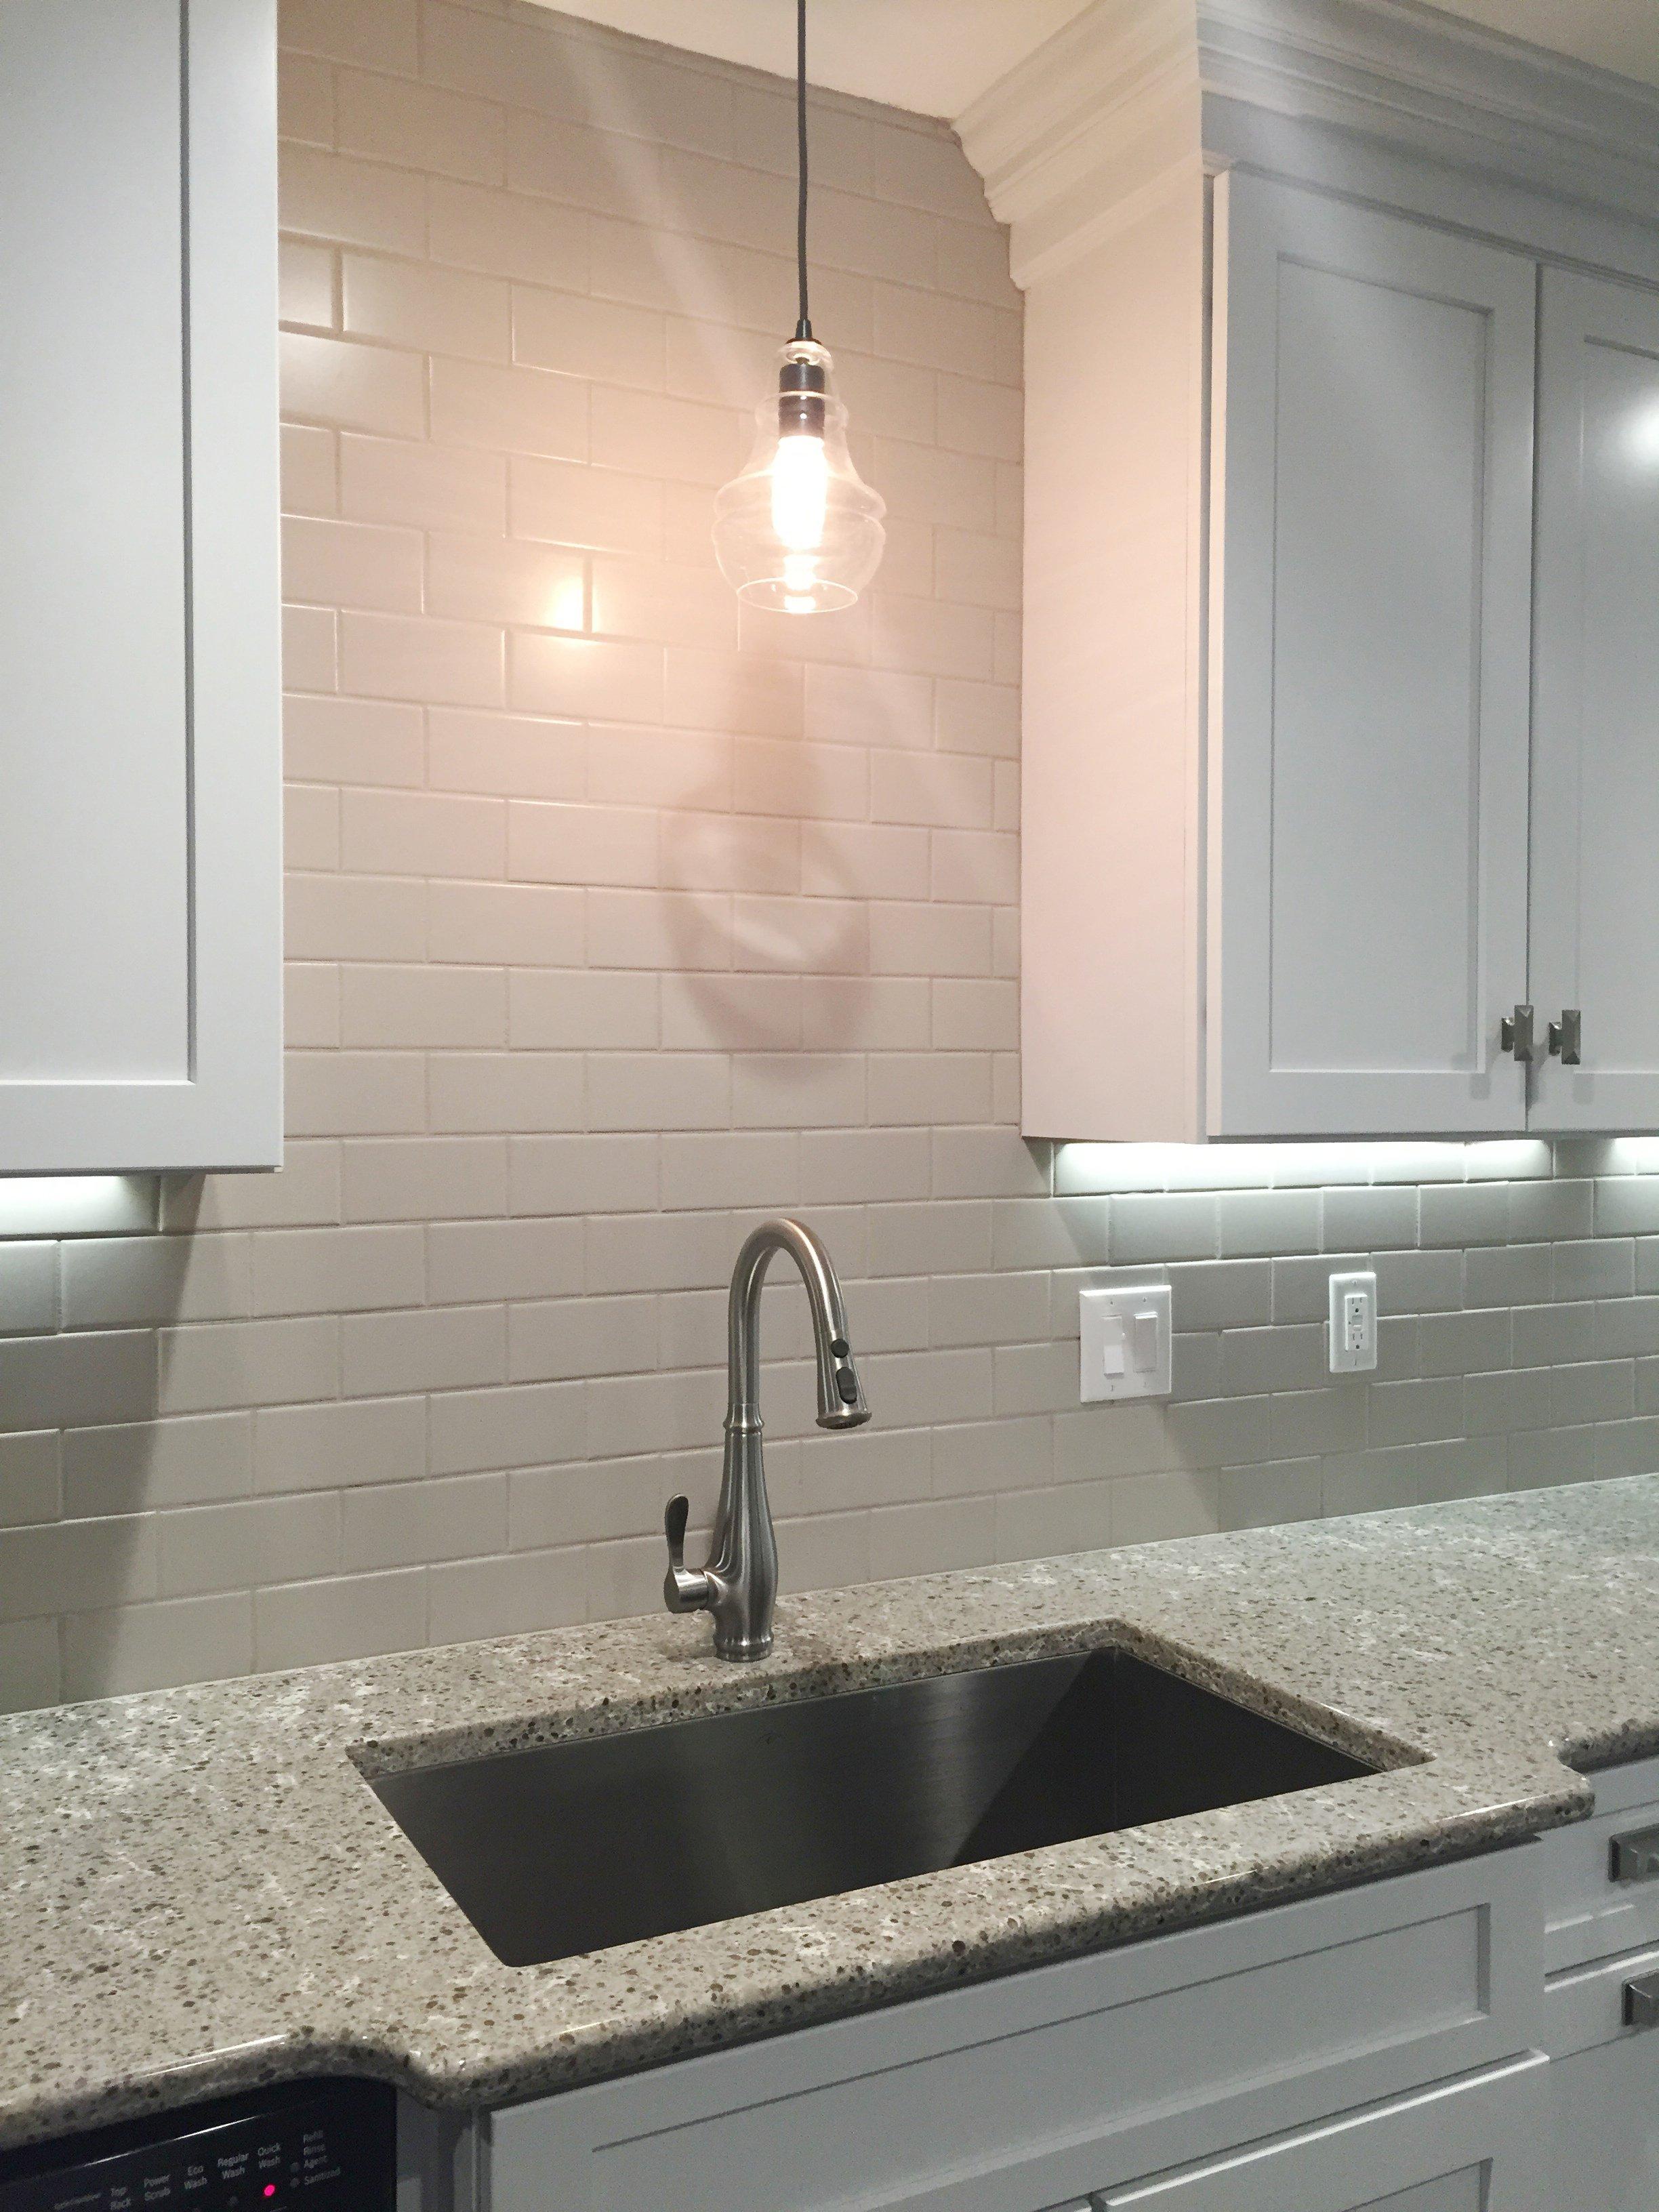 Kitchens Pendant Lighting Brings Style And Illumination Aco